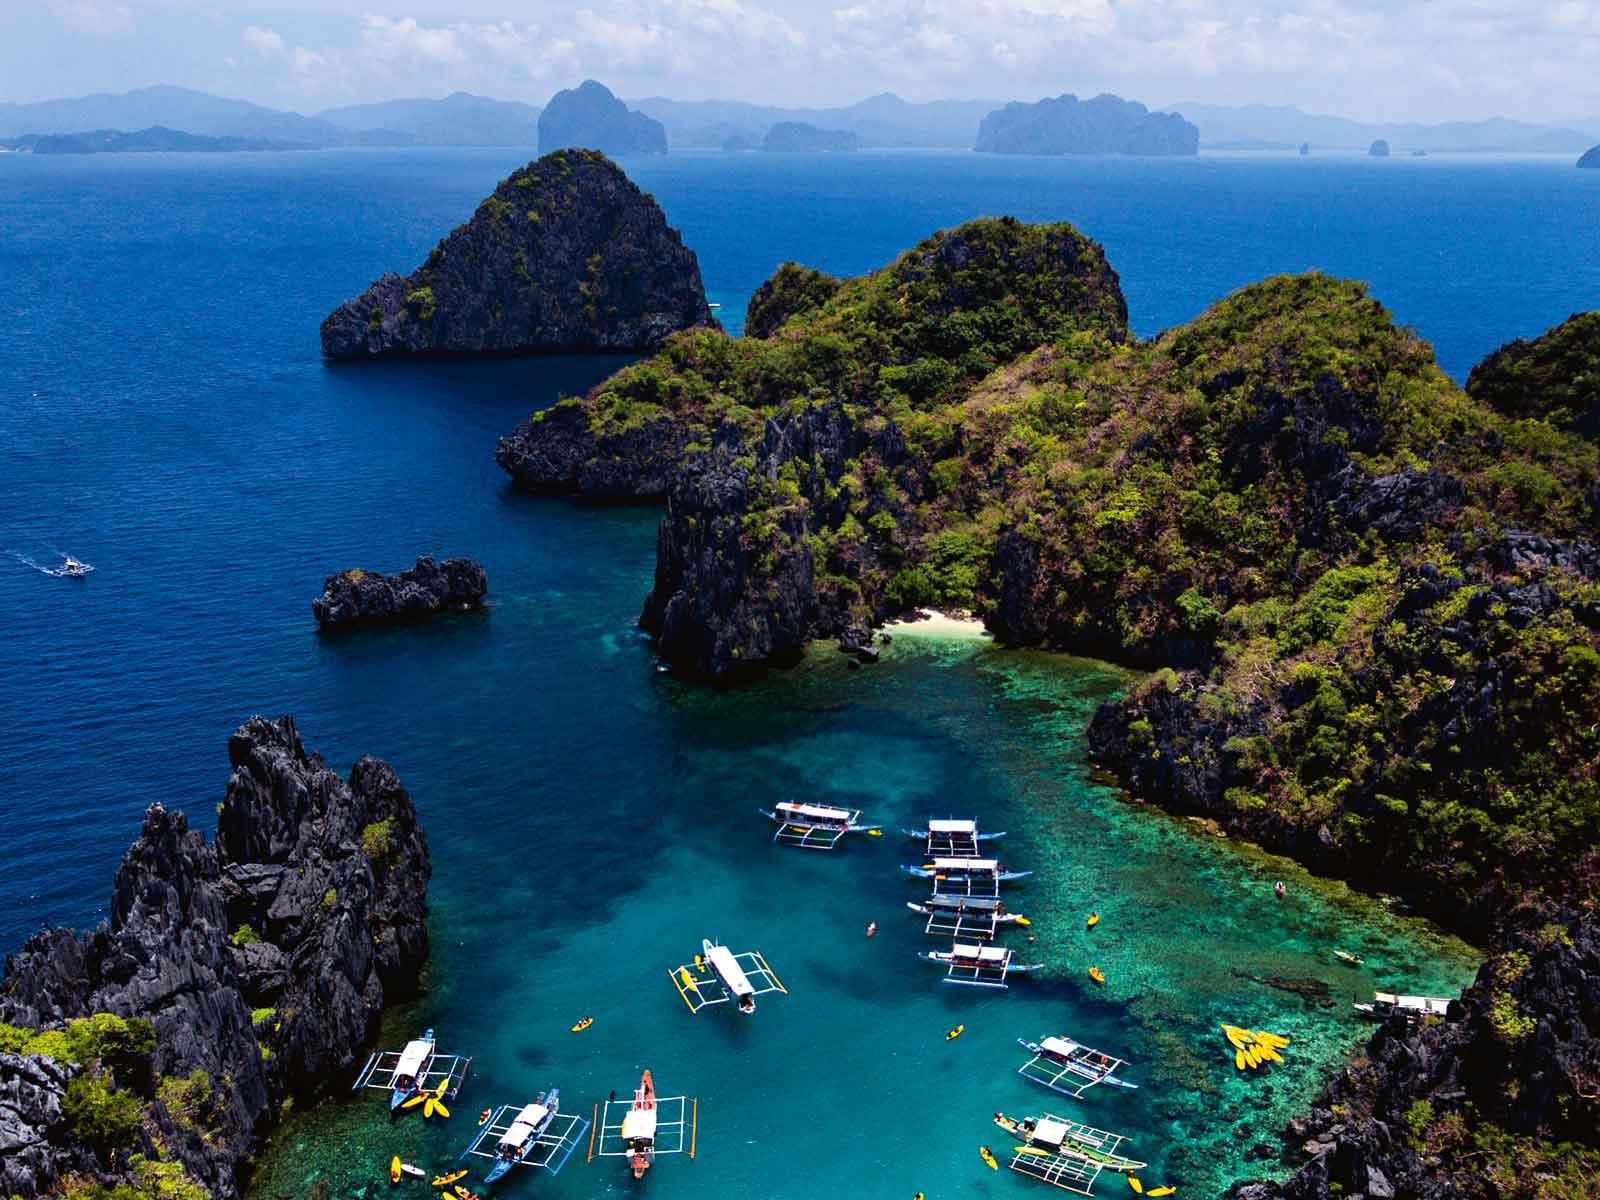 Indahnya Pesona Palawan Island, Dinobatkan Sebagai Pulau Terbaik di Dunia 3